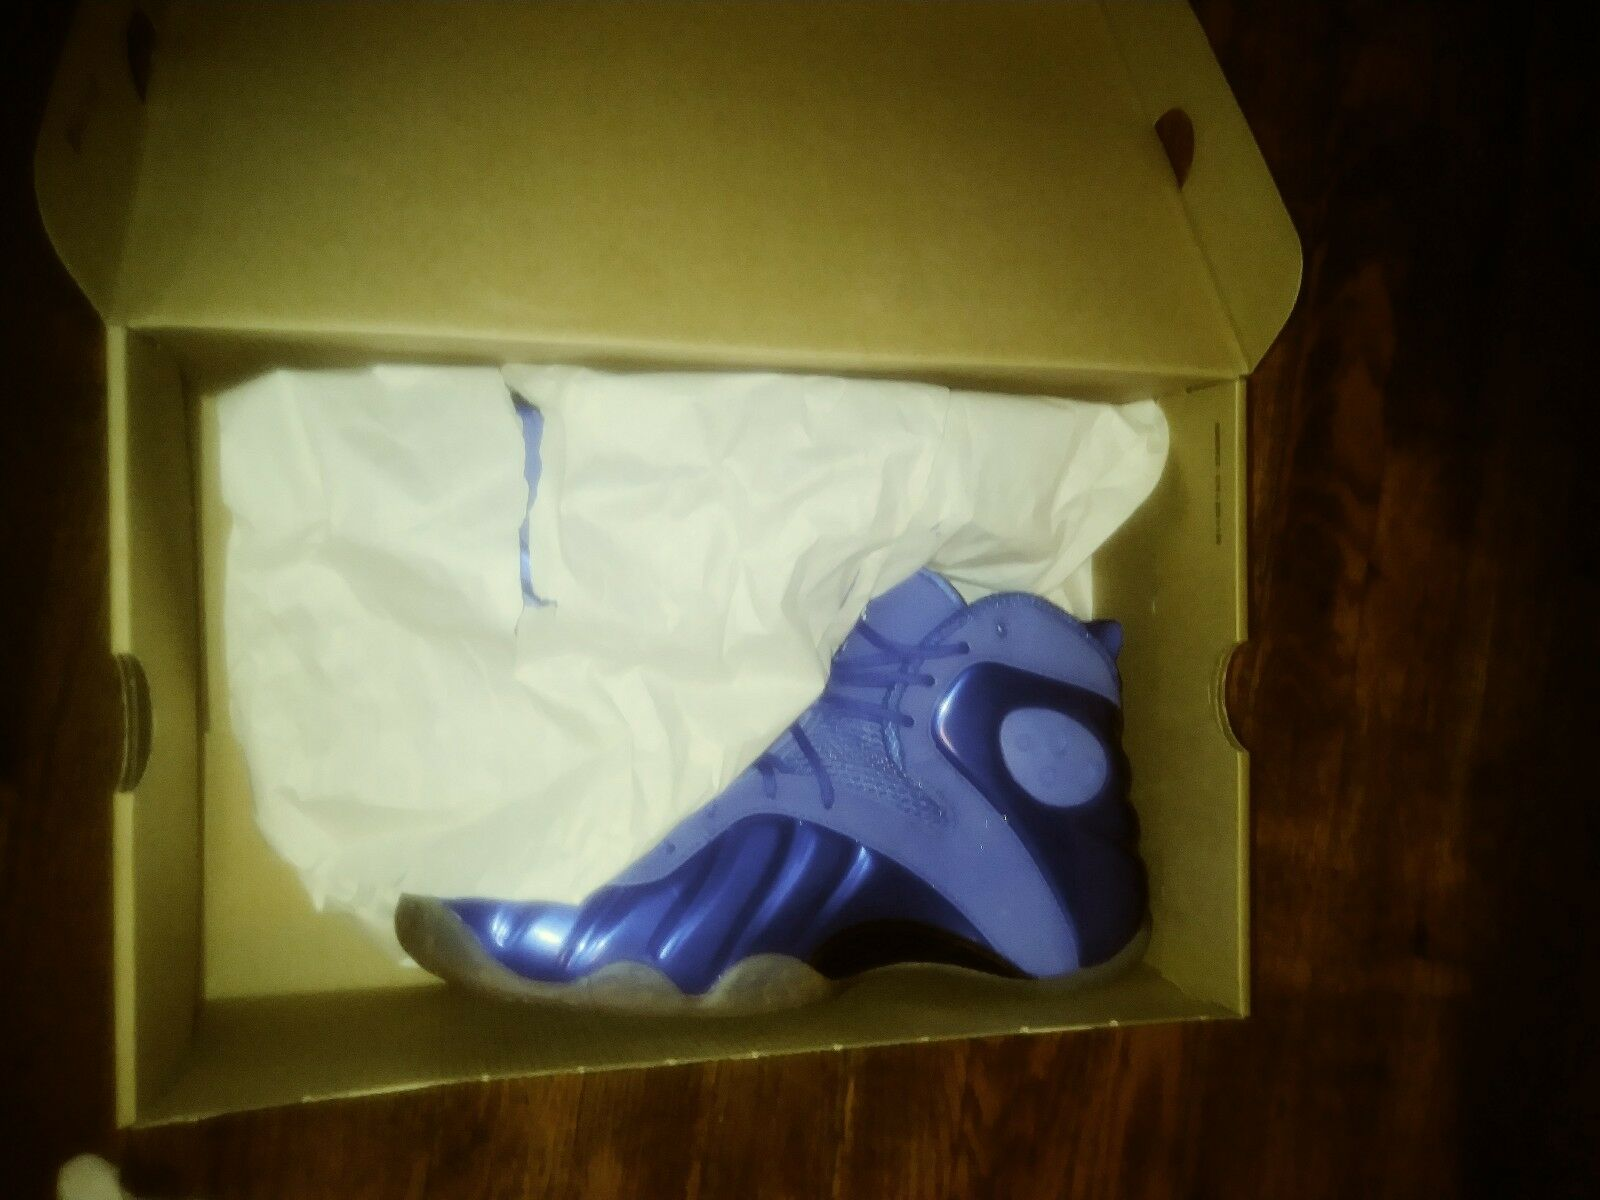 nike rookie royal blue zoom 1 2 3 4 5 6 7 8 9 10 11 12 13 14 15